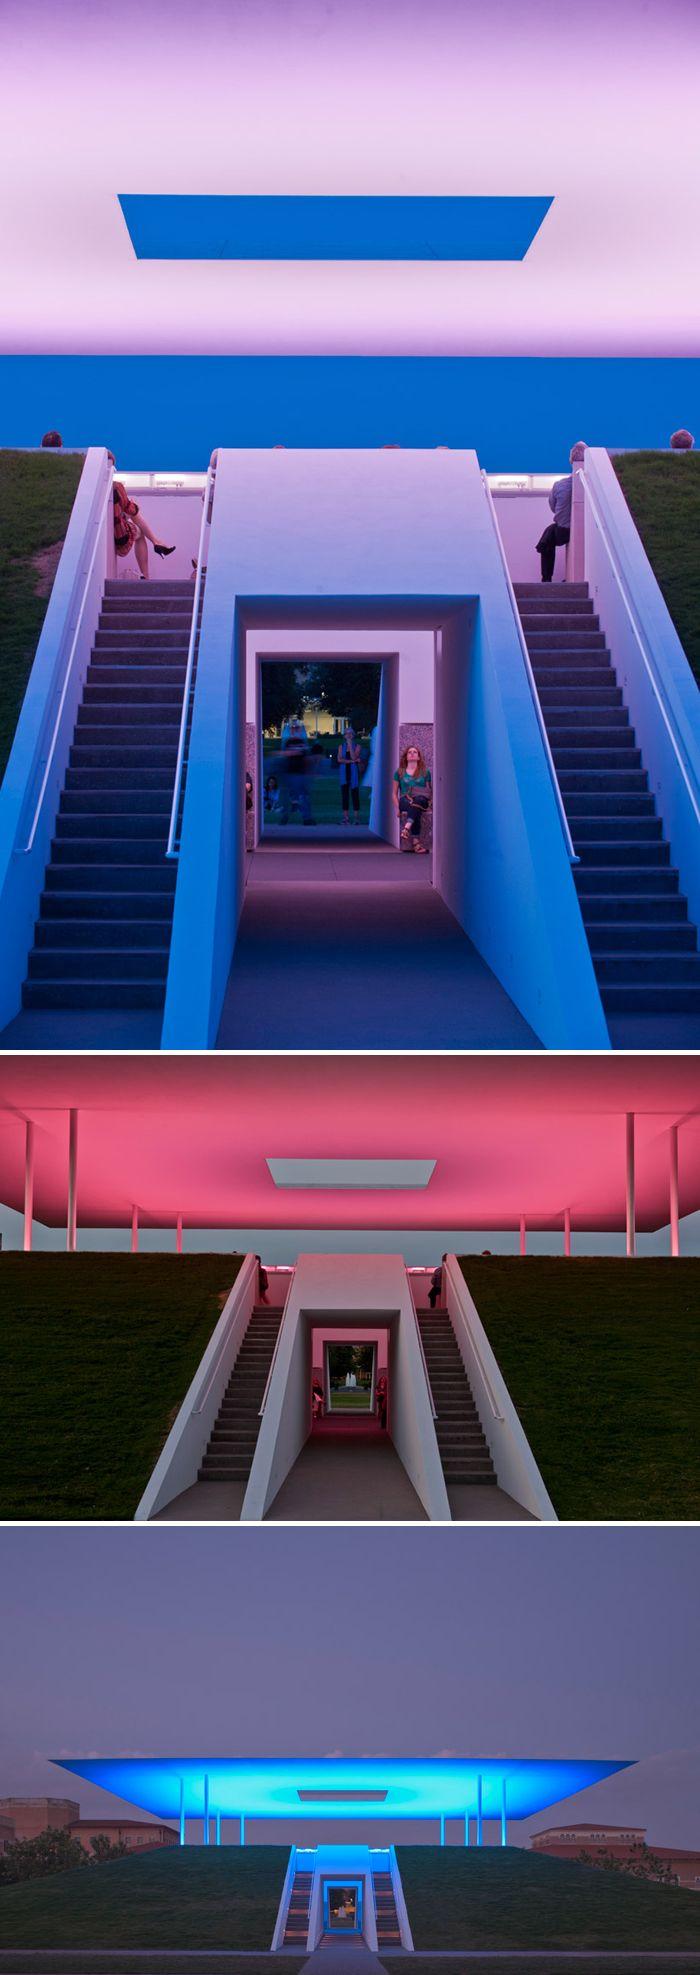 TwilightEpiphany by James Turrell at Rice University